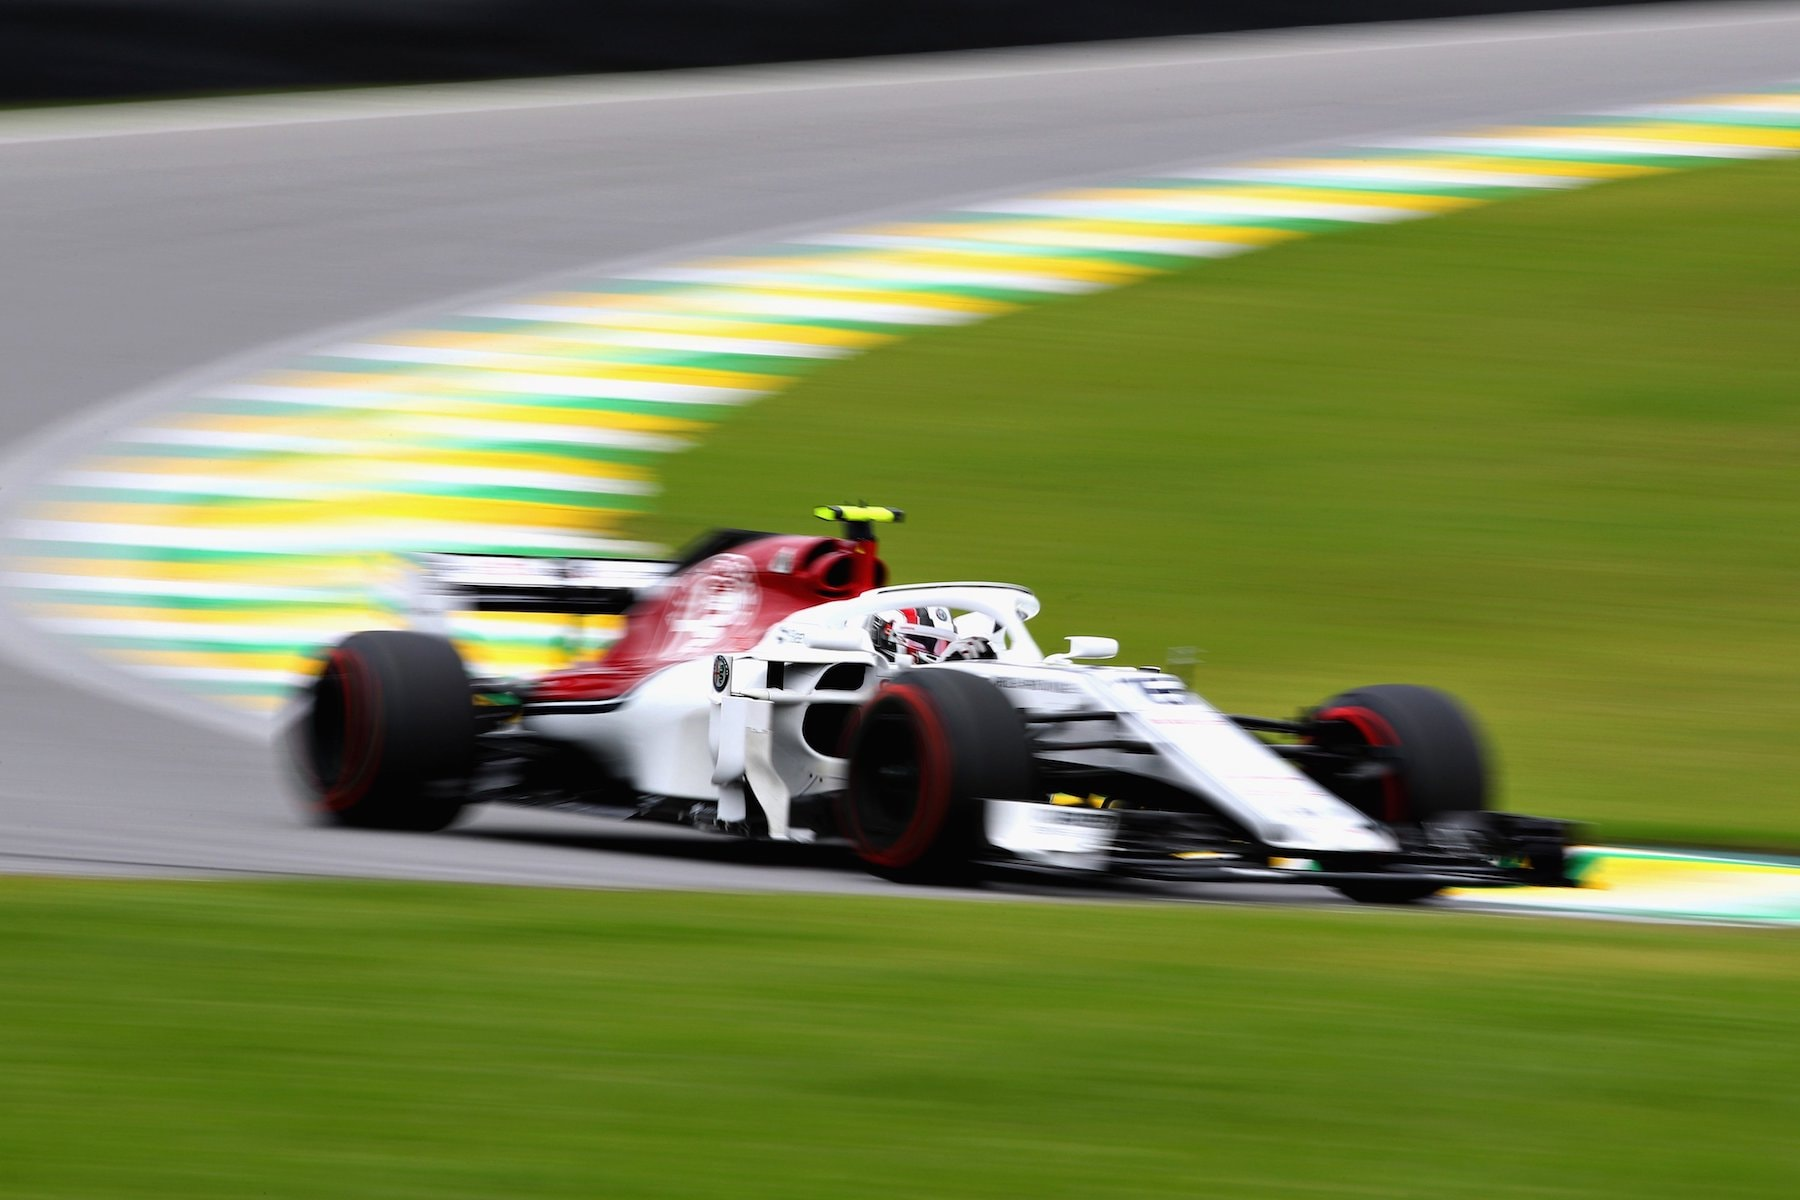 2 2018 Charles Leclerc | Sauber C37 | 2018 Brazilian GP Q2 1 copy.jpg